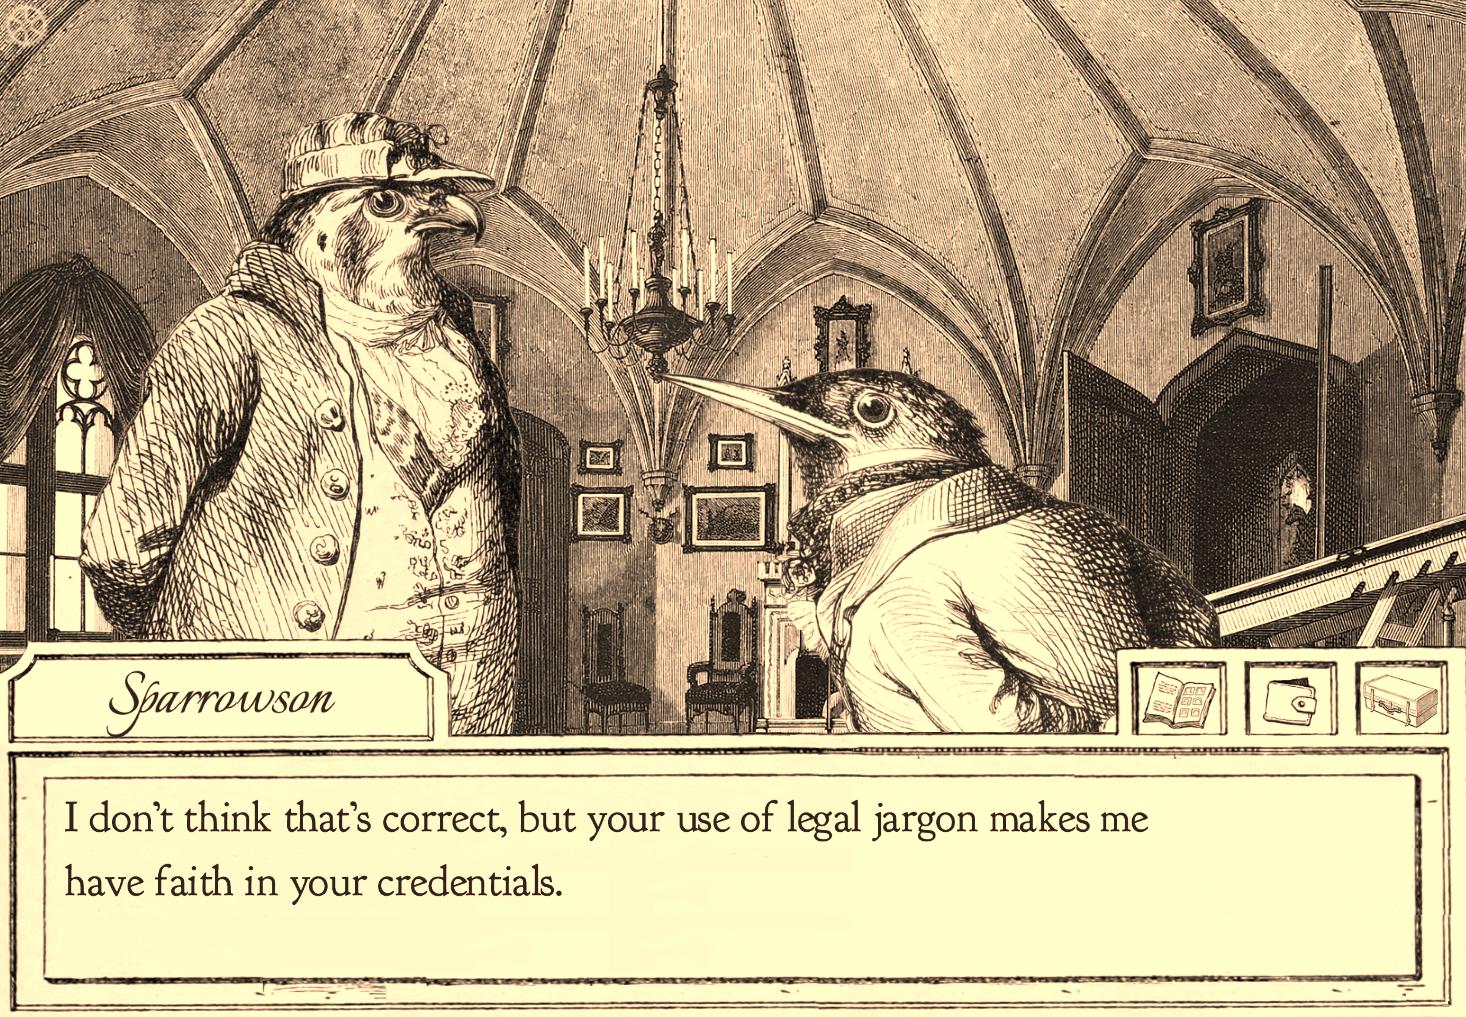 aviary-attorney-pc-humble-bundle-3